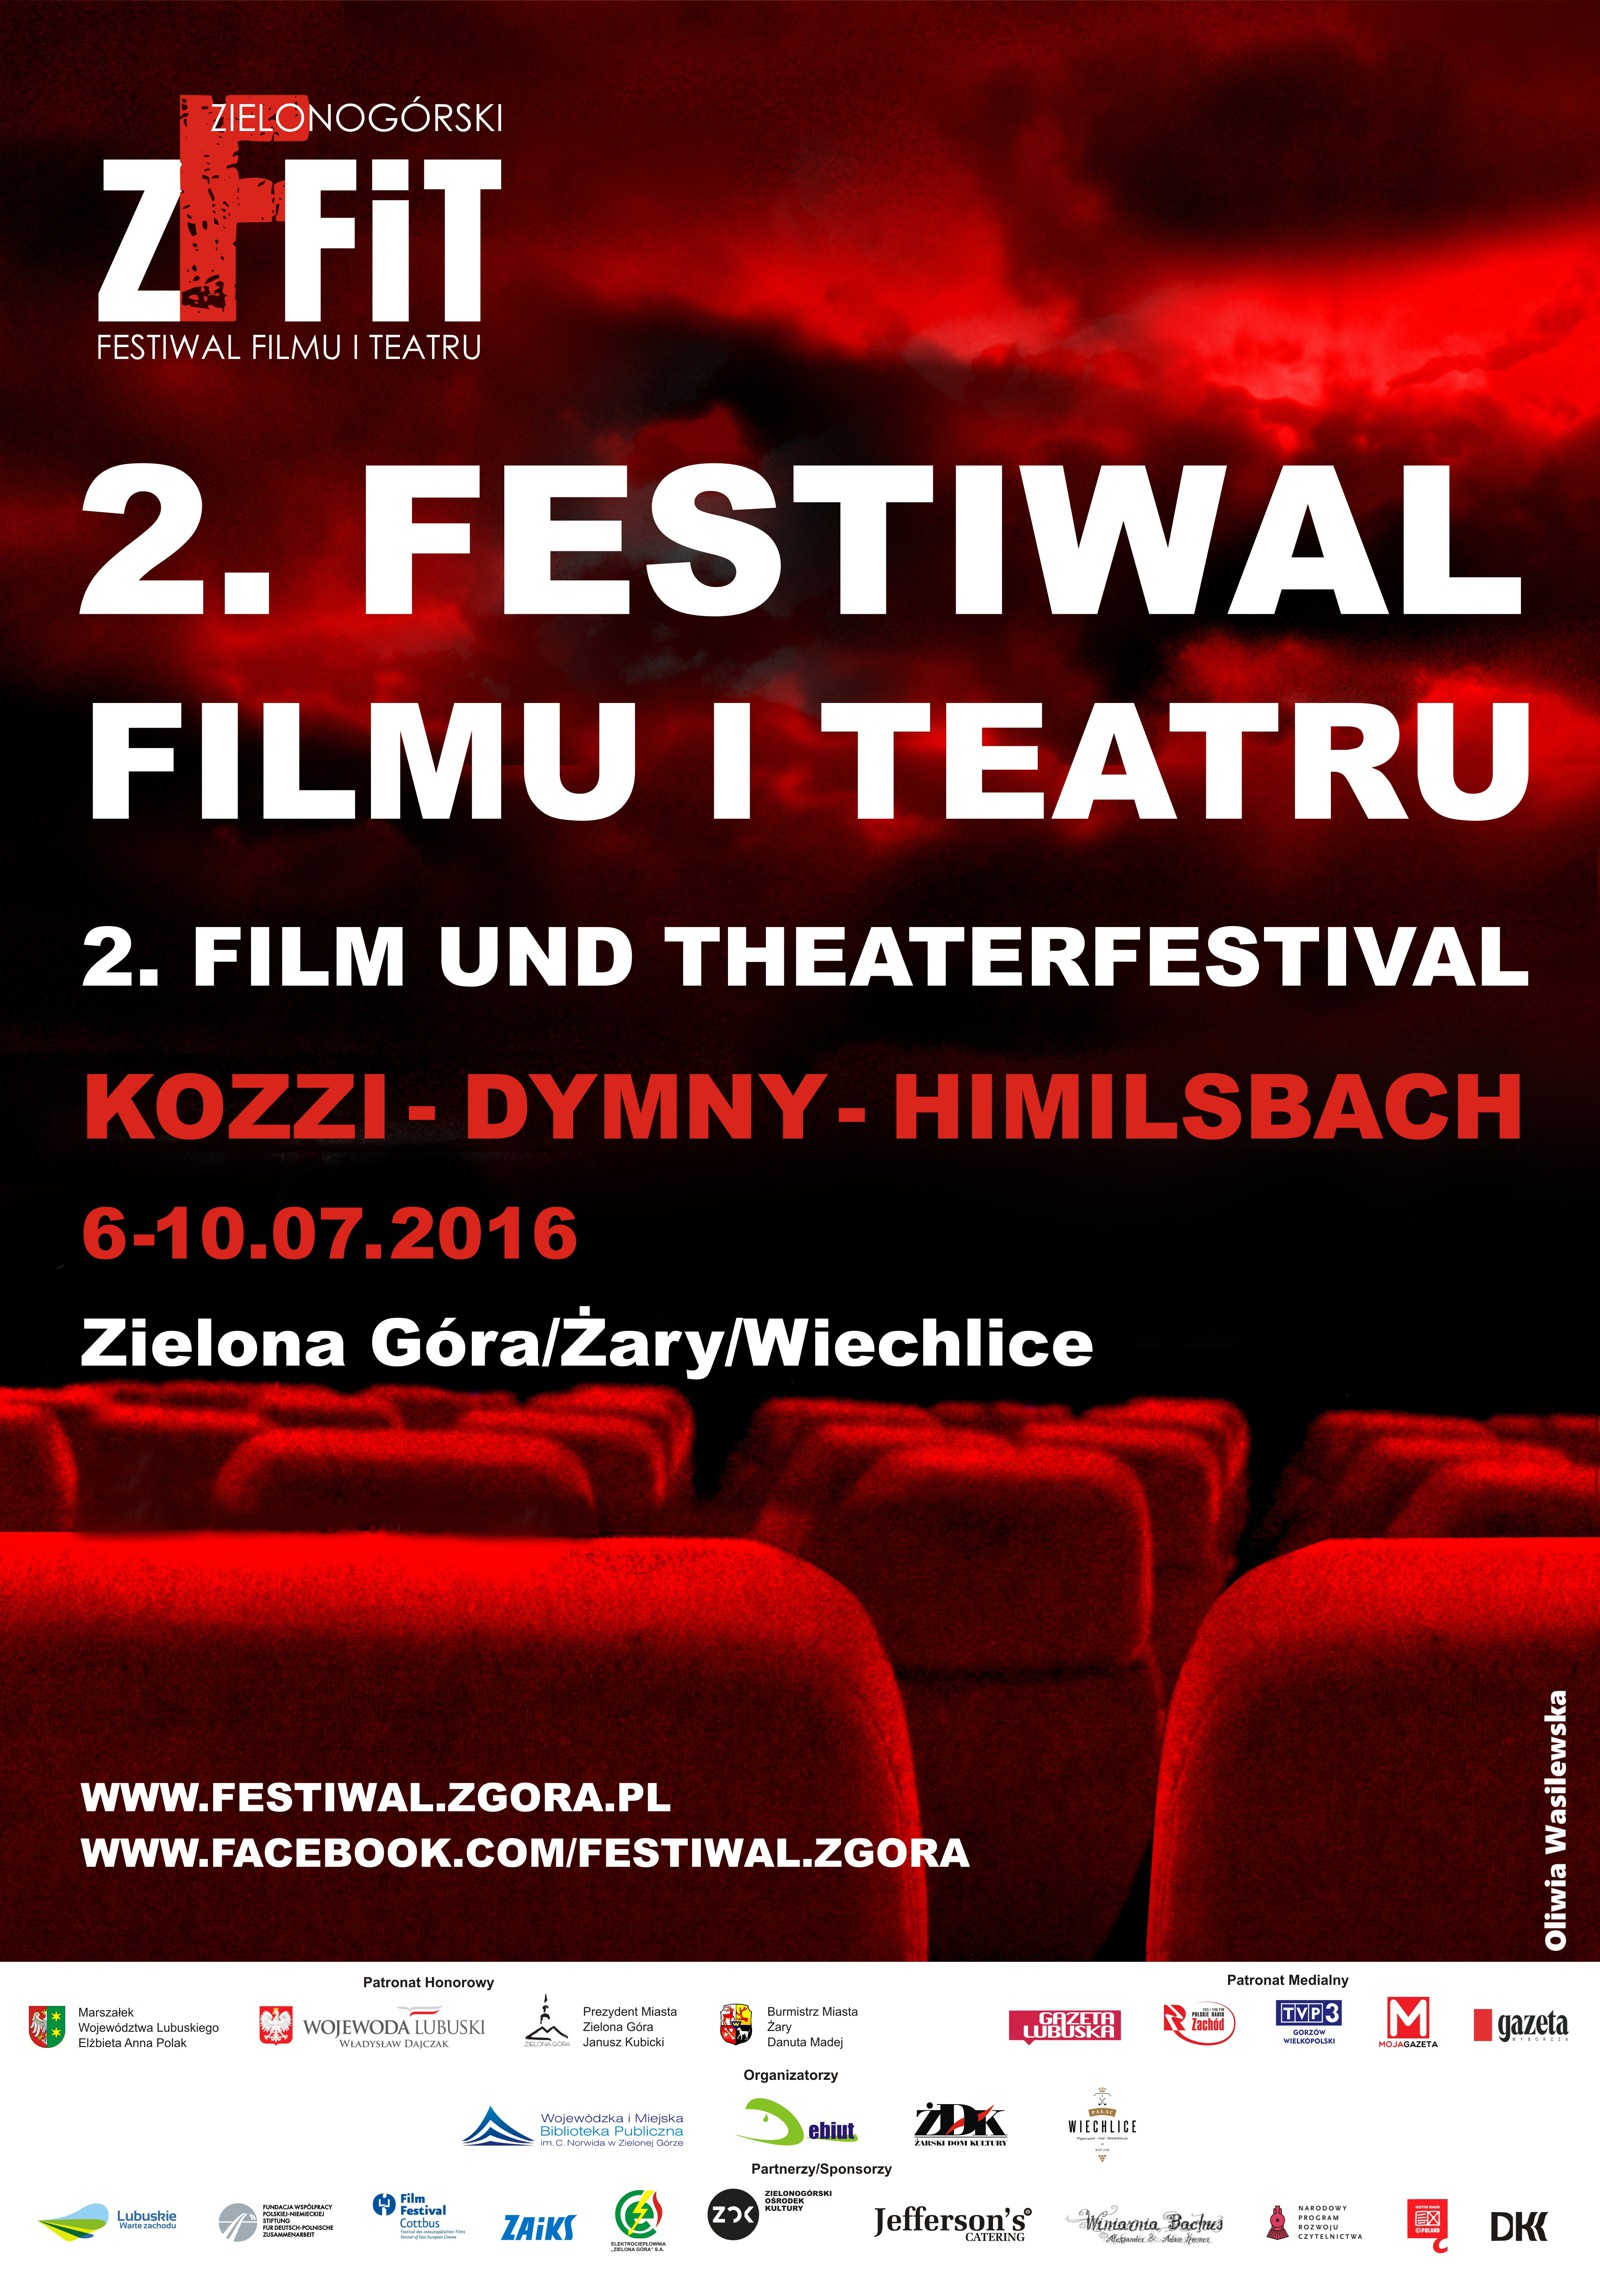 Ilustracja do informacji: 2. Festiwal Filmu i Teatru